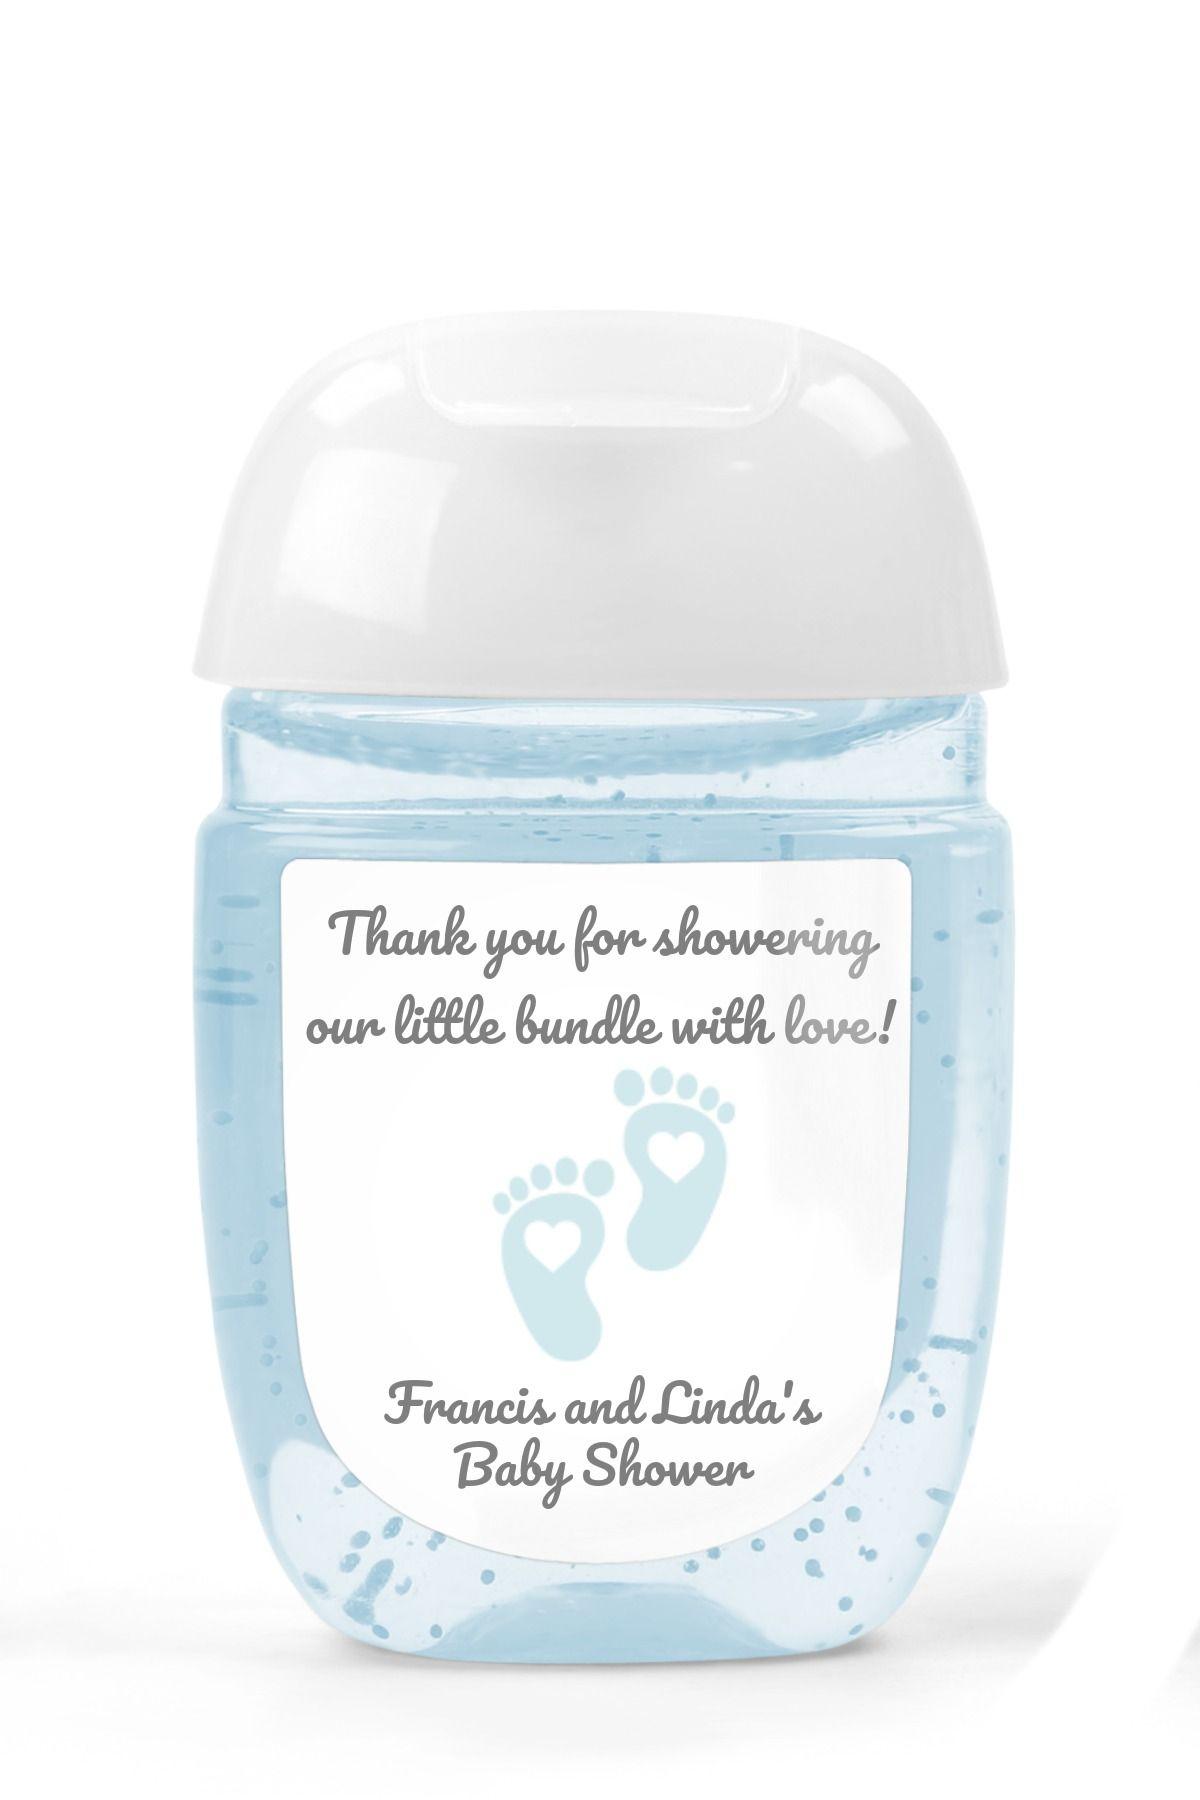 Blue Gem Pocketbac Holder By Bath Body Works Hand Sanitizer